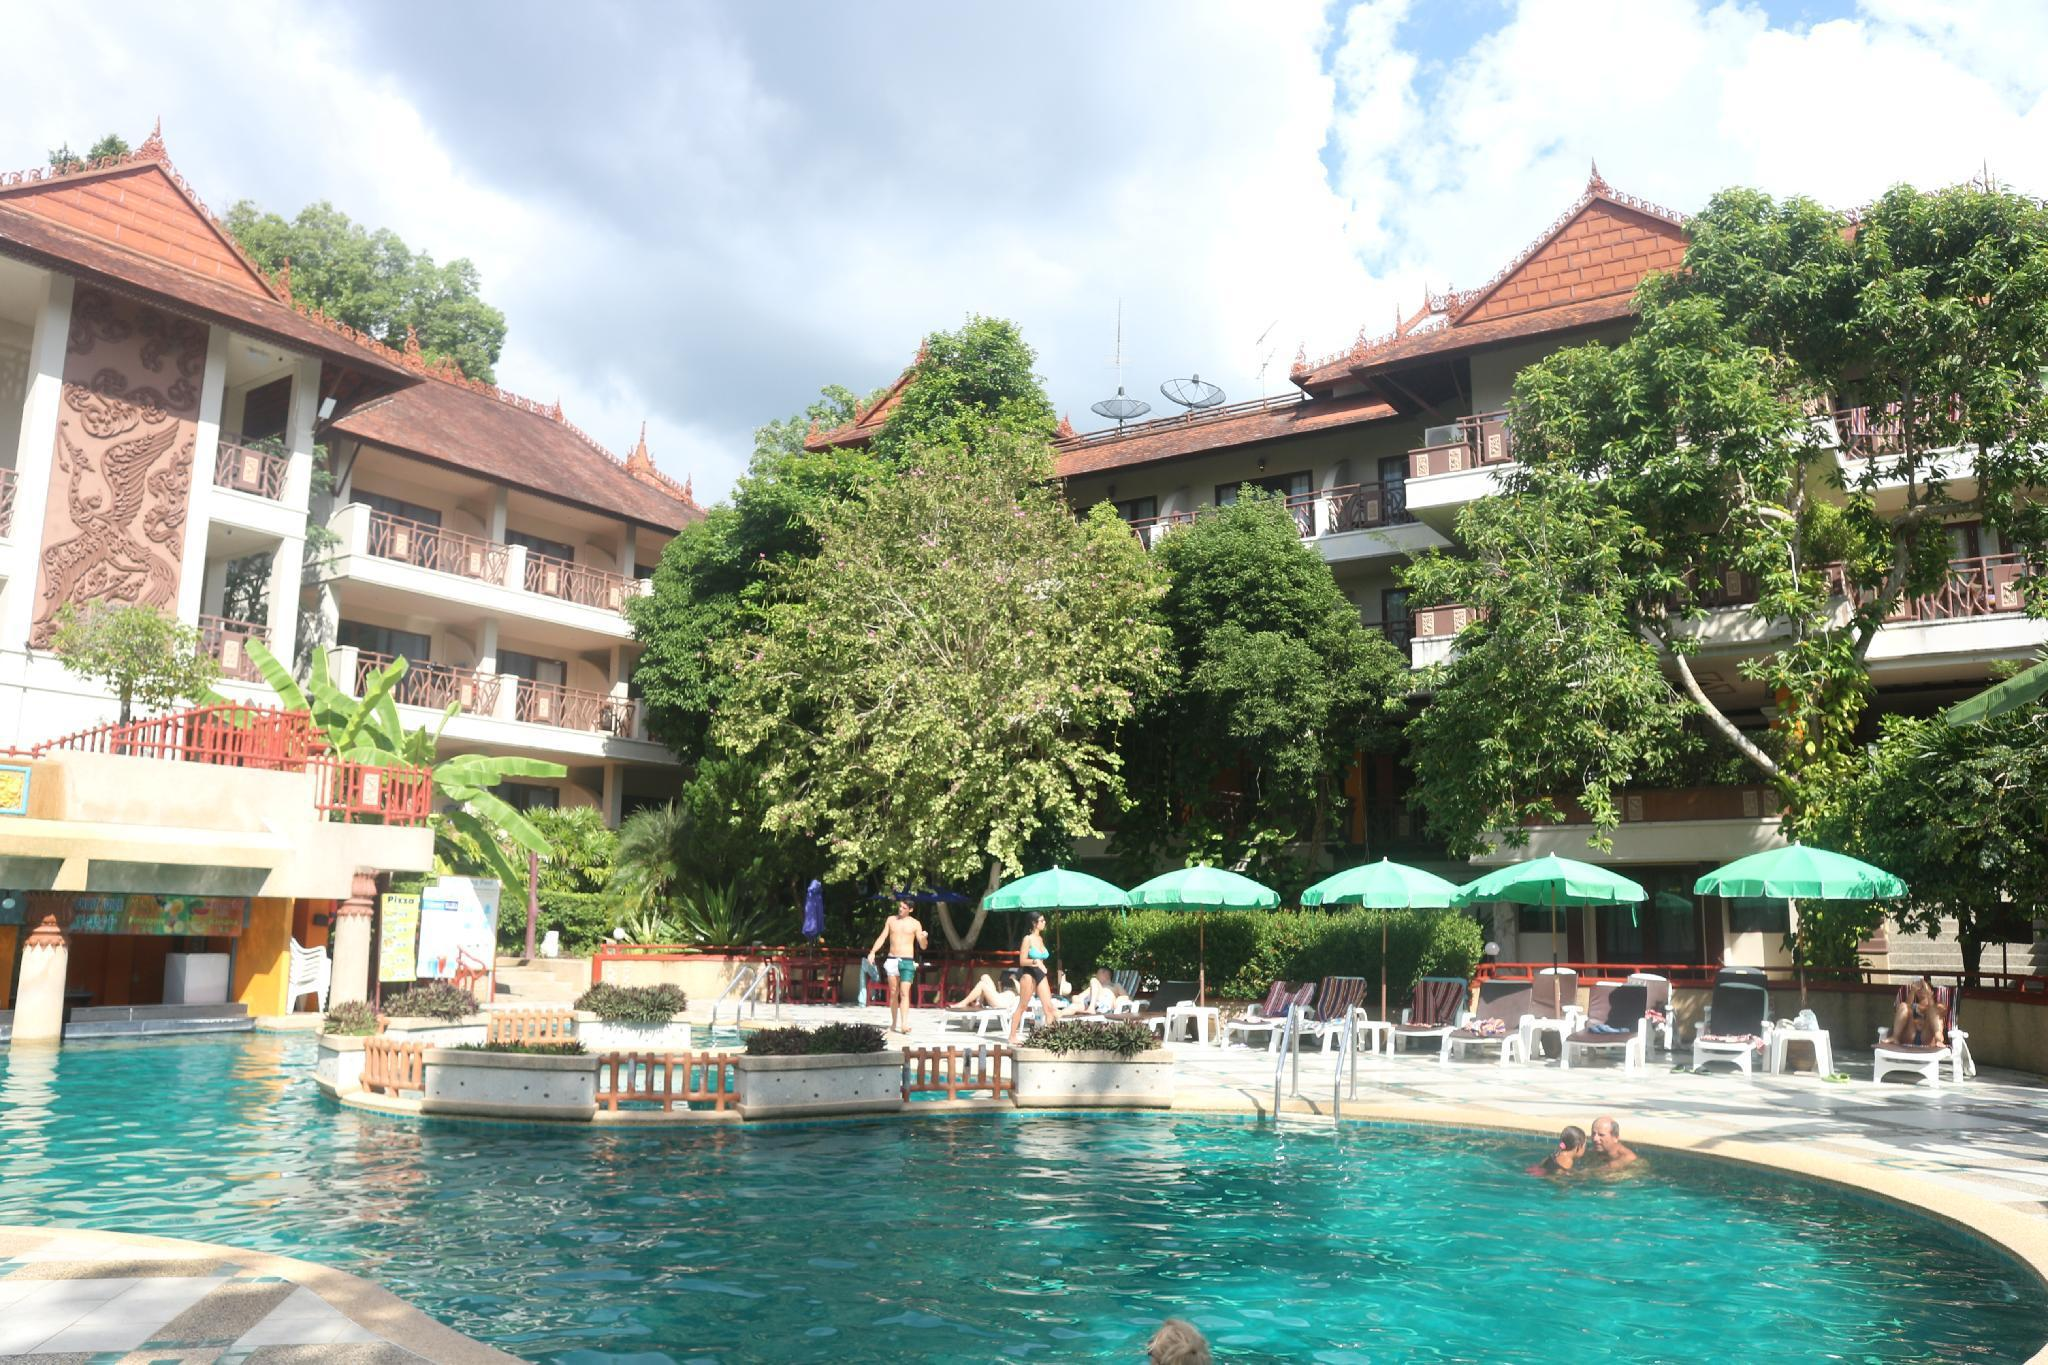 Anyavee Ao Nang Bay Resort อัญญาวี อ่าวนาง เบย์ รีสอร์ท